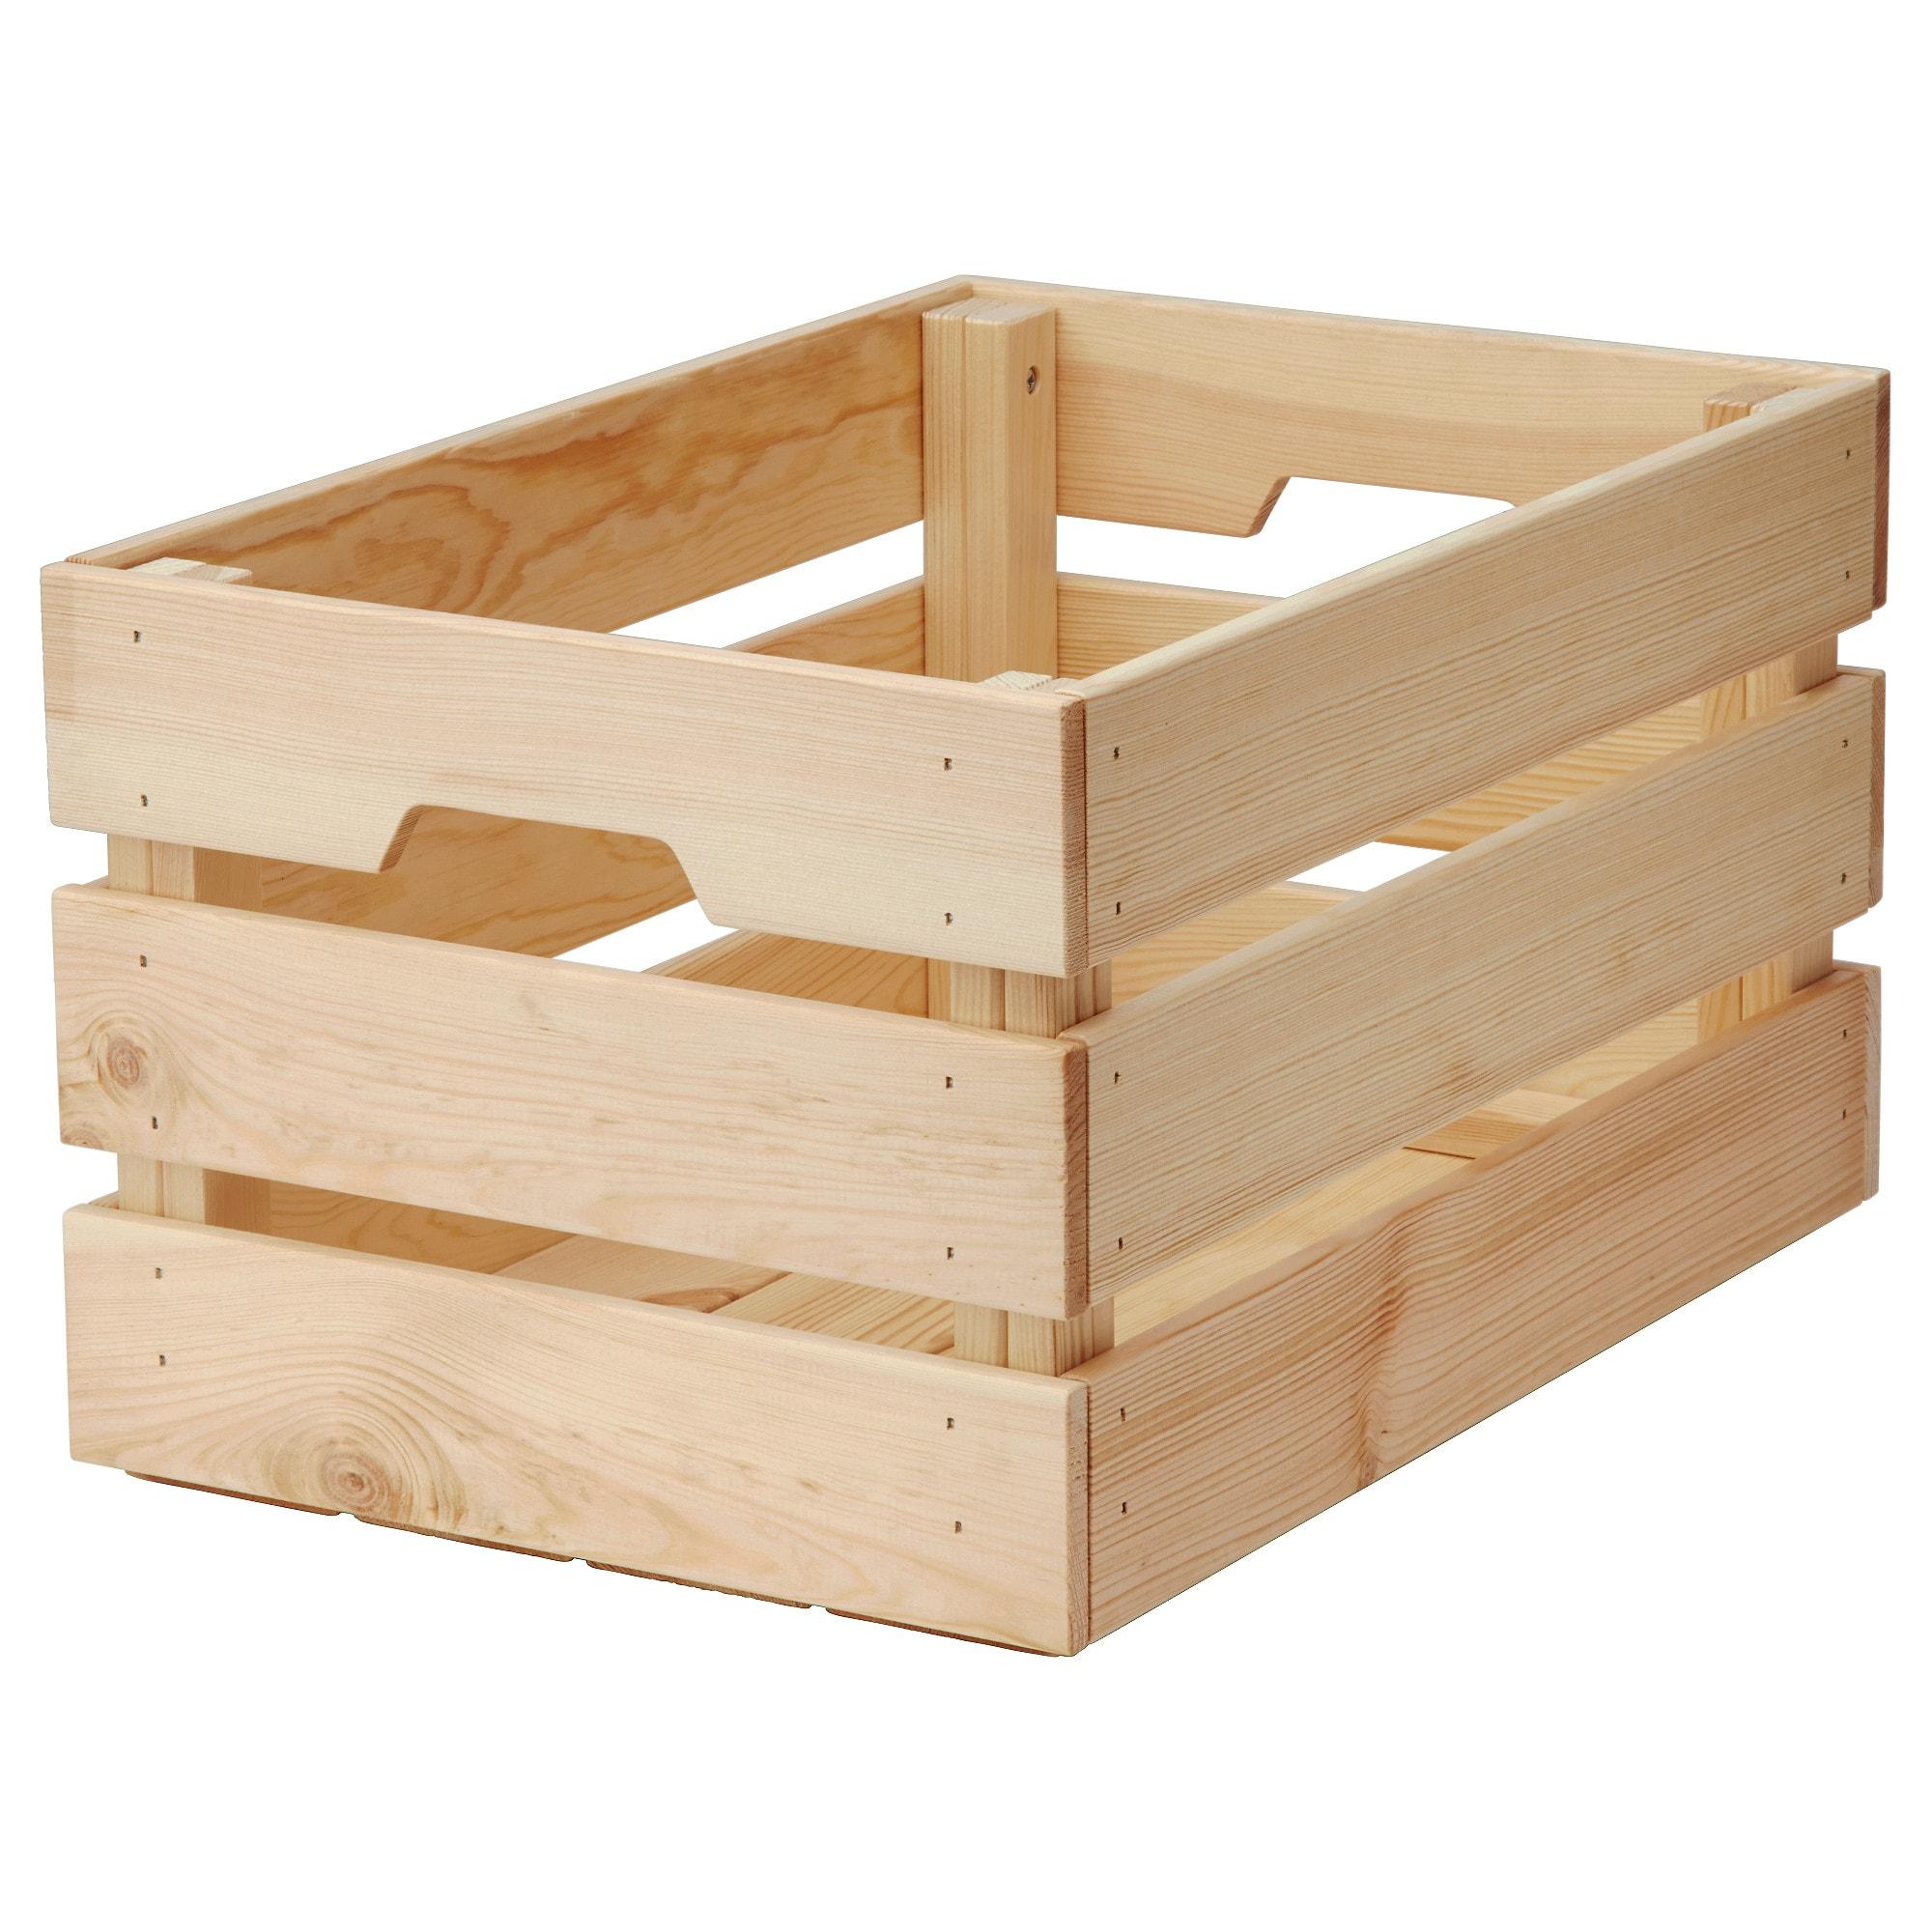 Ikea Australia Affordable Swedish Home Furniture Ikea Crates Ikea Storage Wine Crate